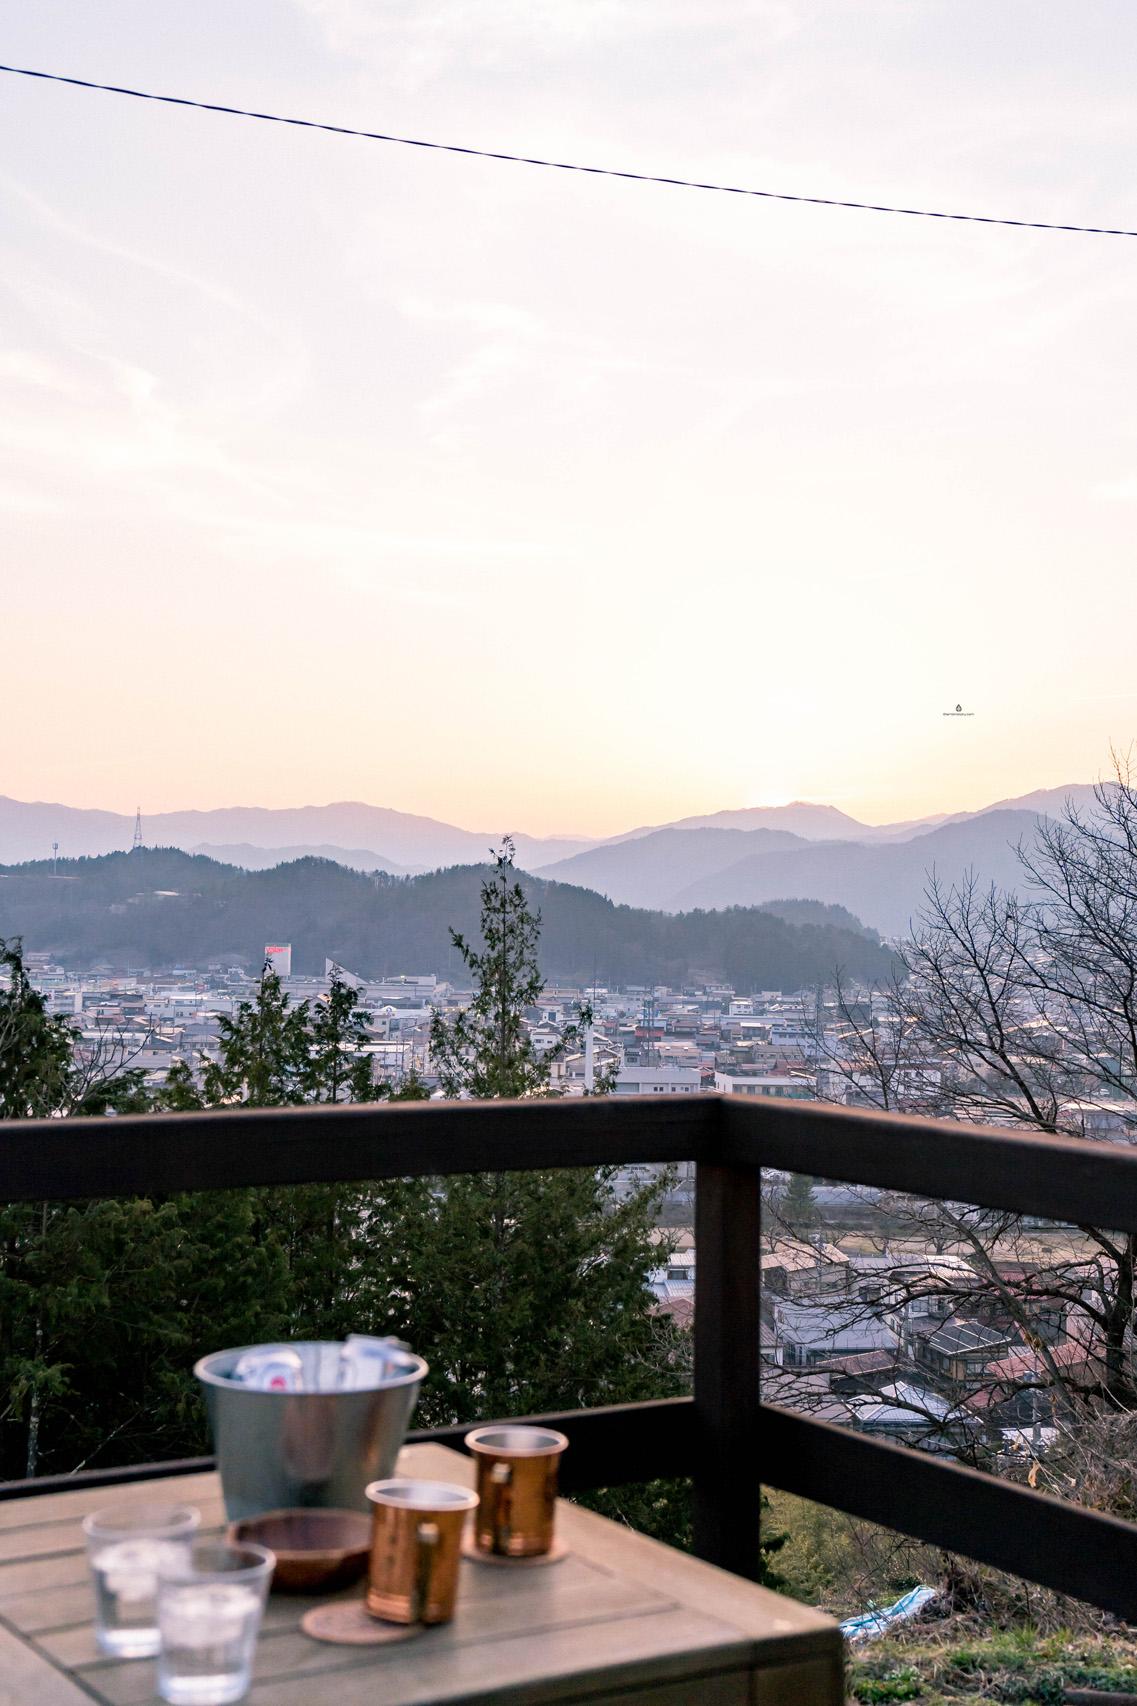 View of Takayama from Ichii cafe